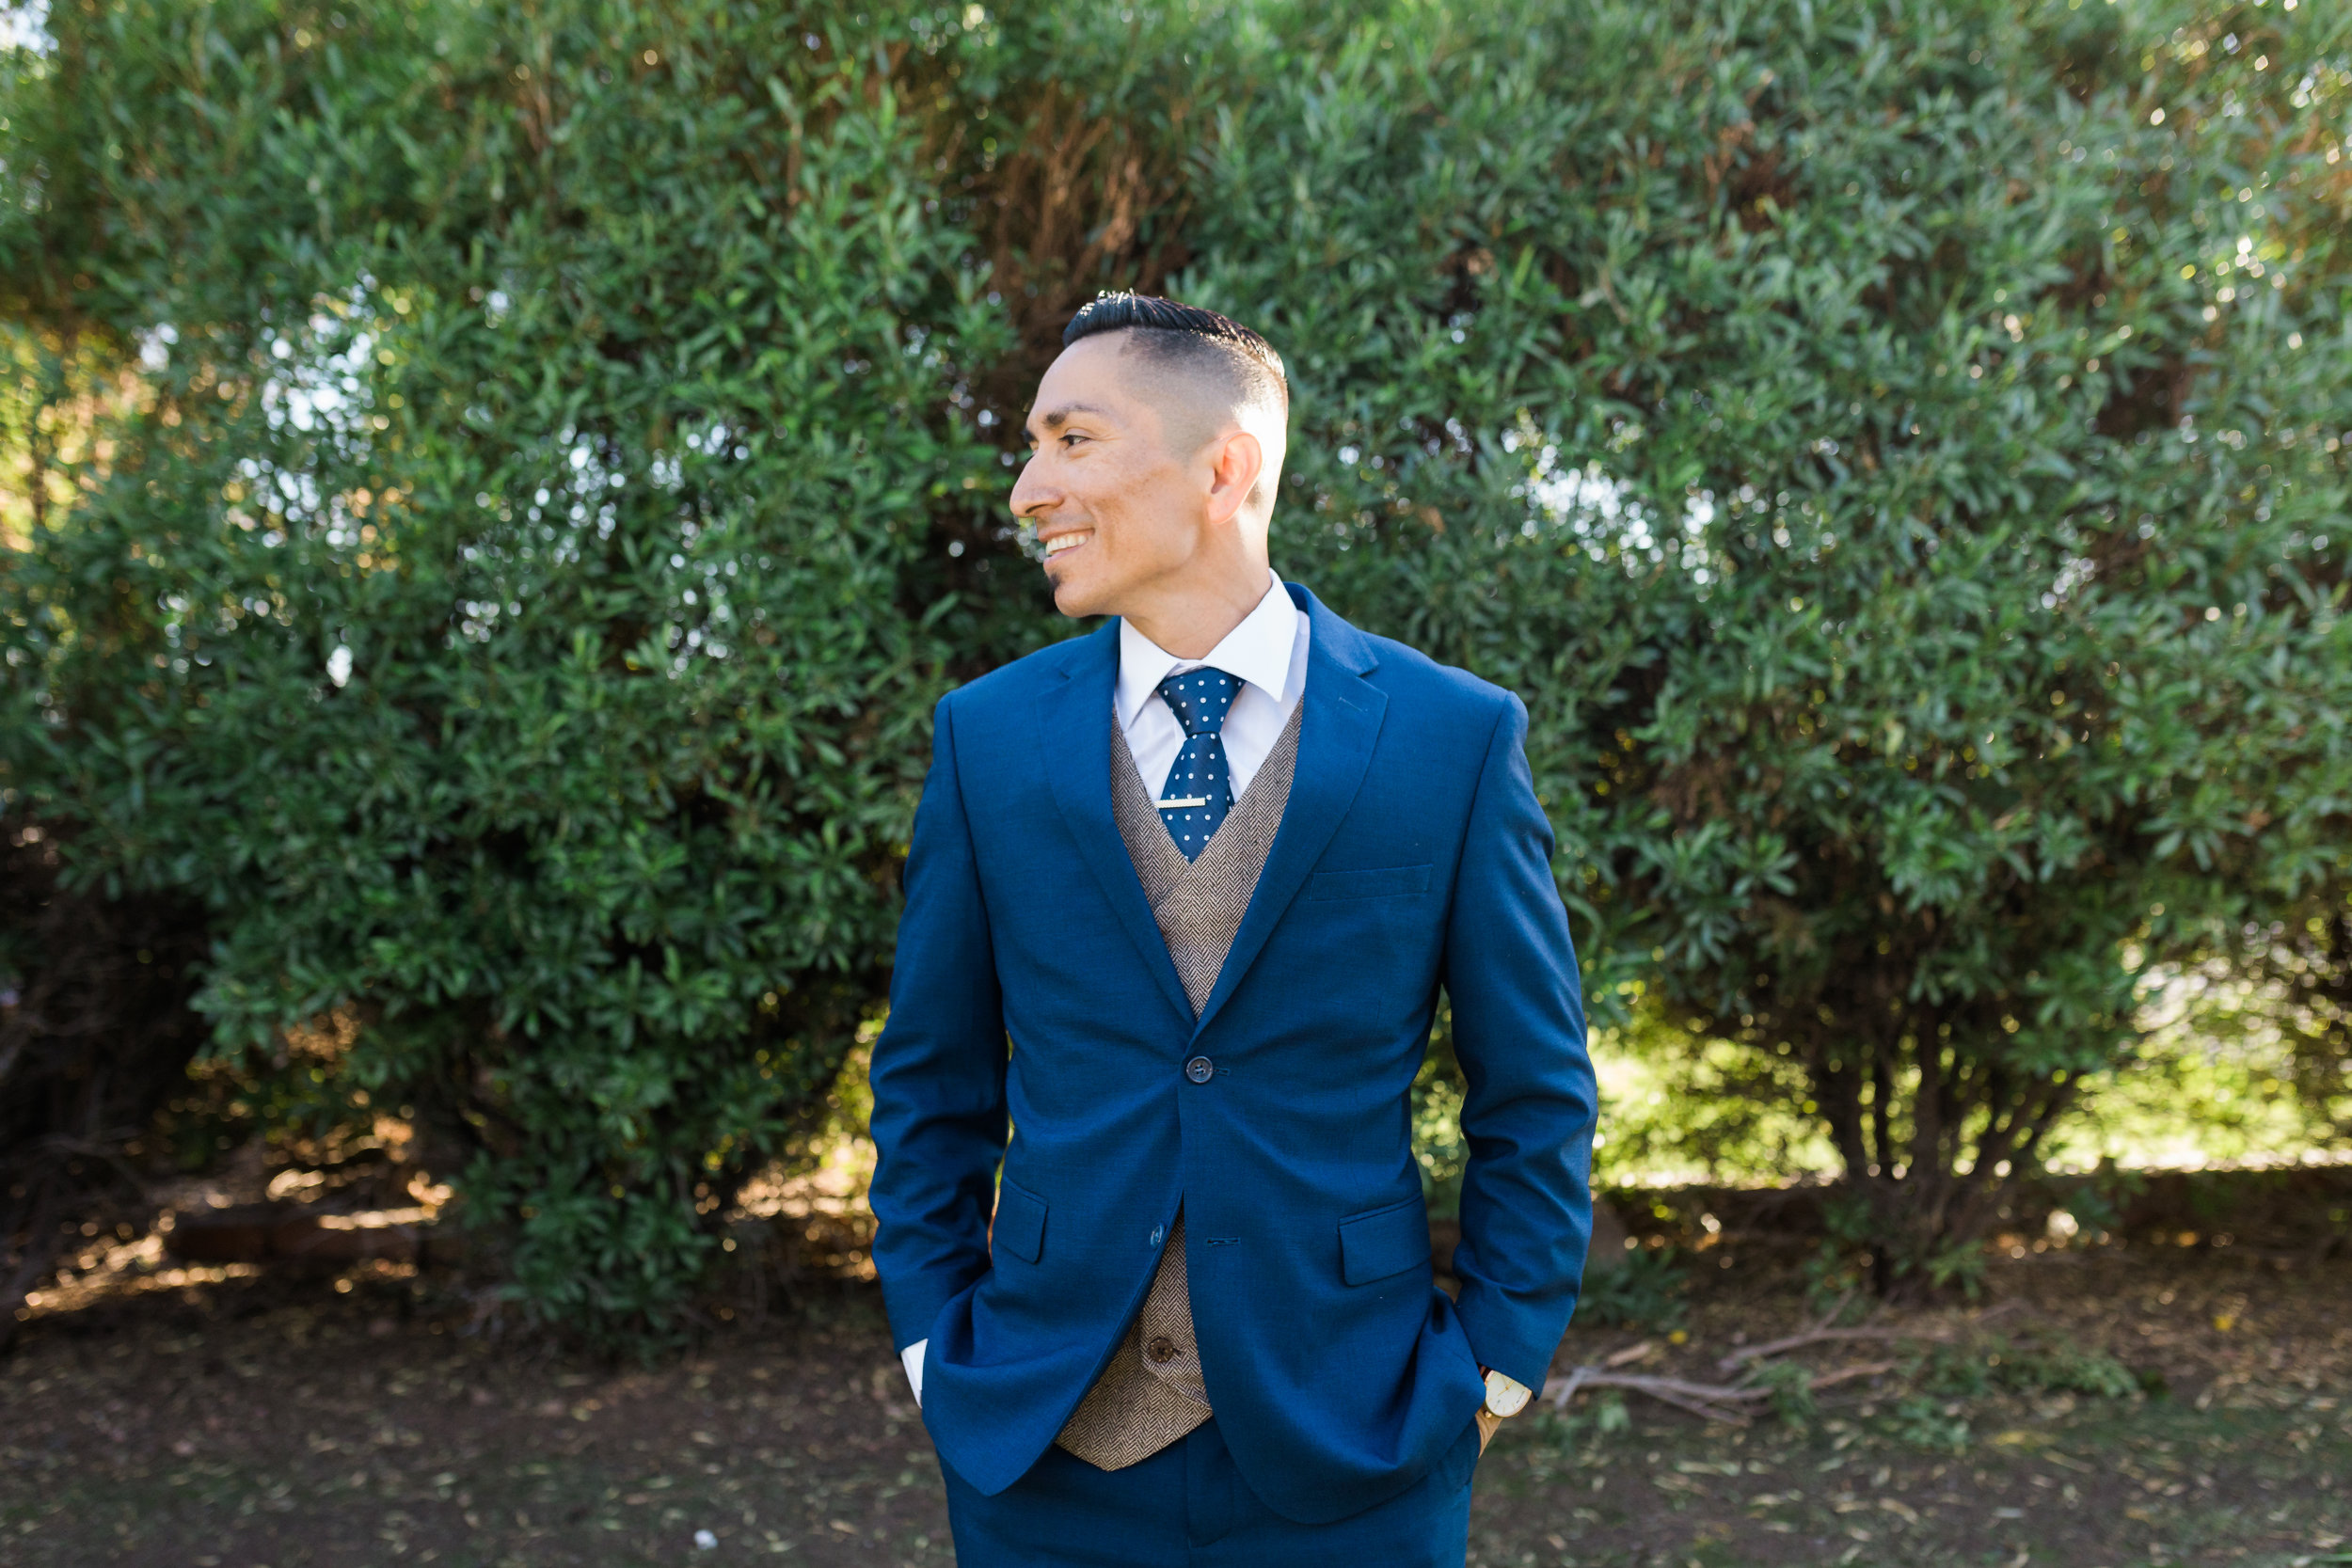 Gather-Estate-Wedding-Mesa-Arizona-Tara-Nichole-Photo-10.jpg